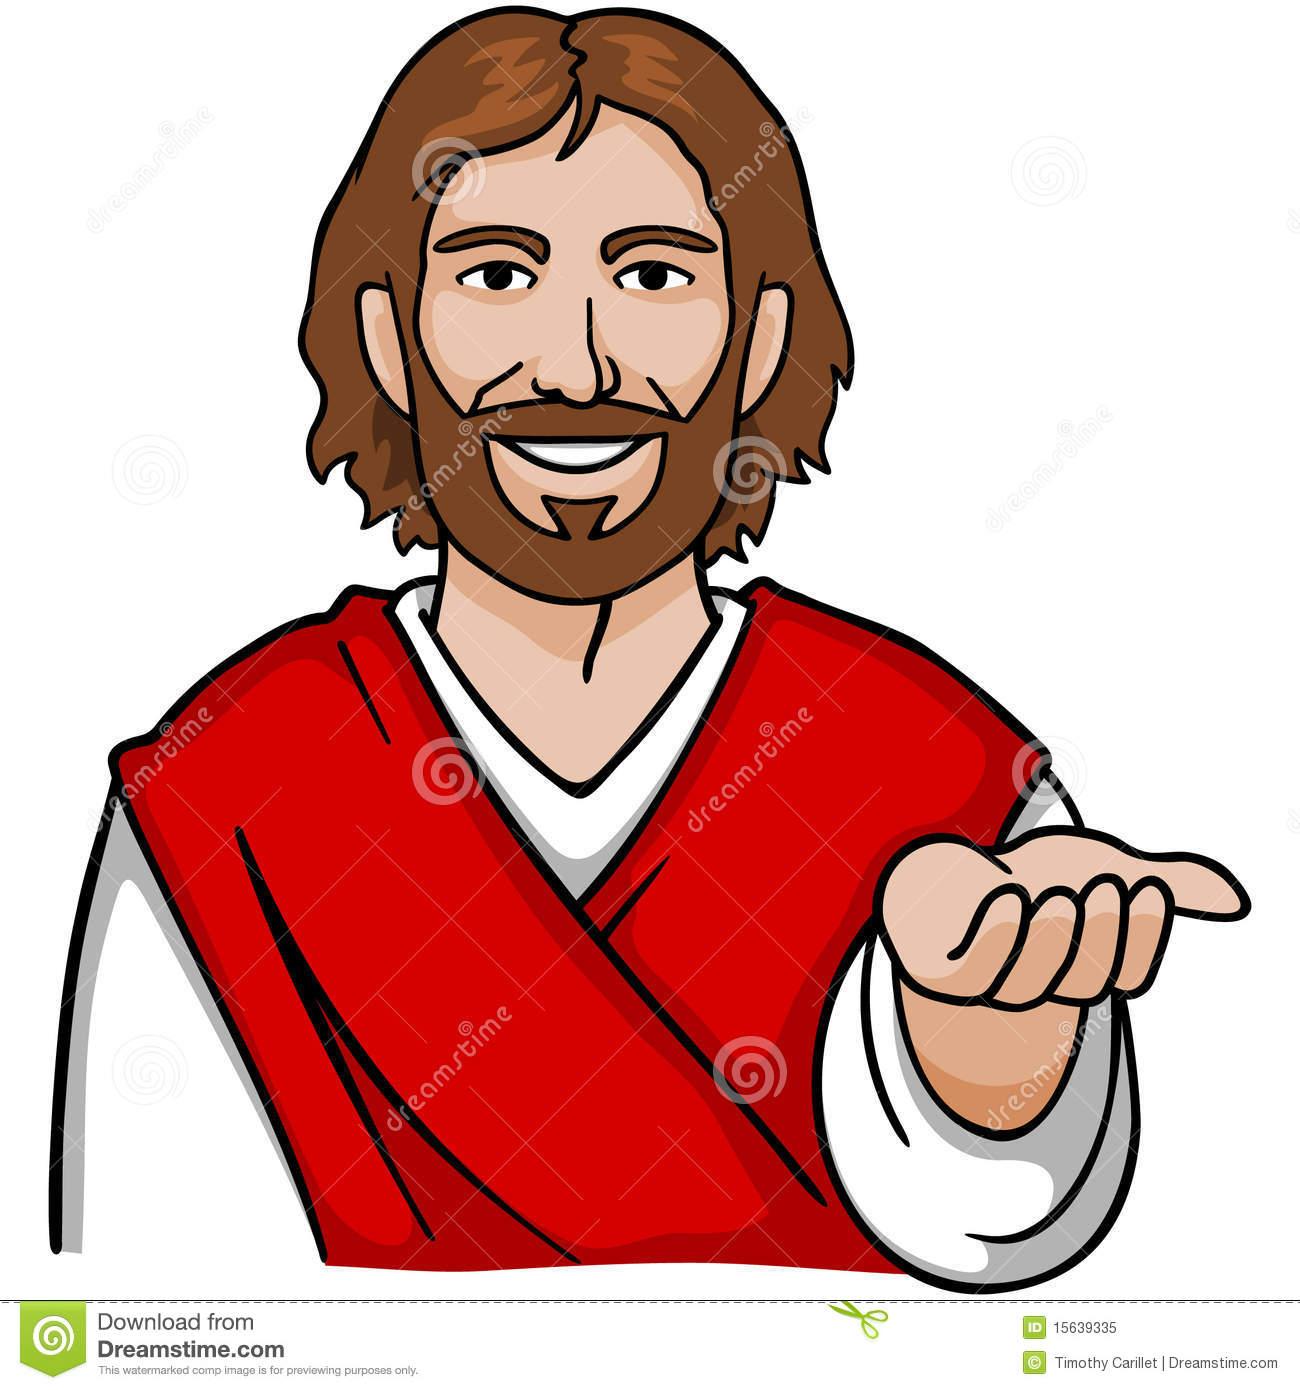 . Jesus clipart